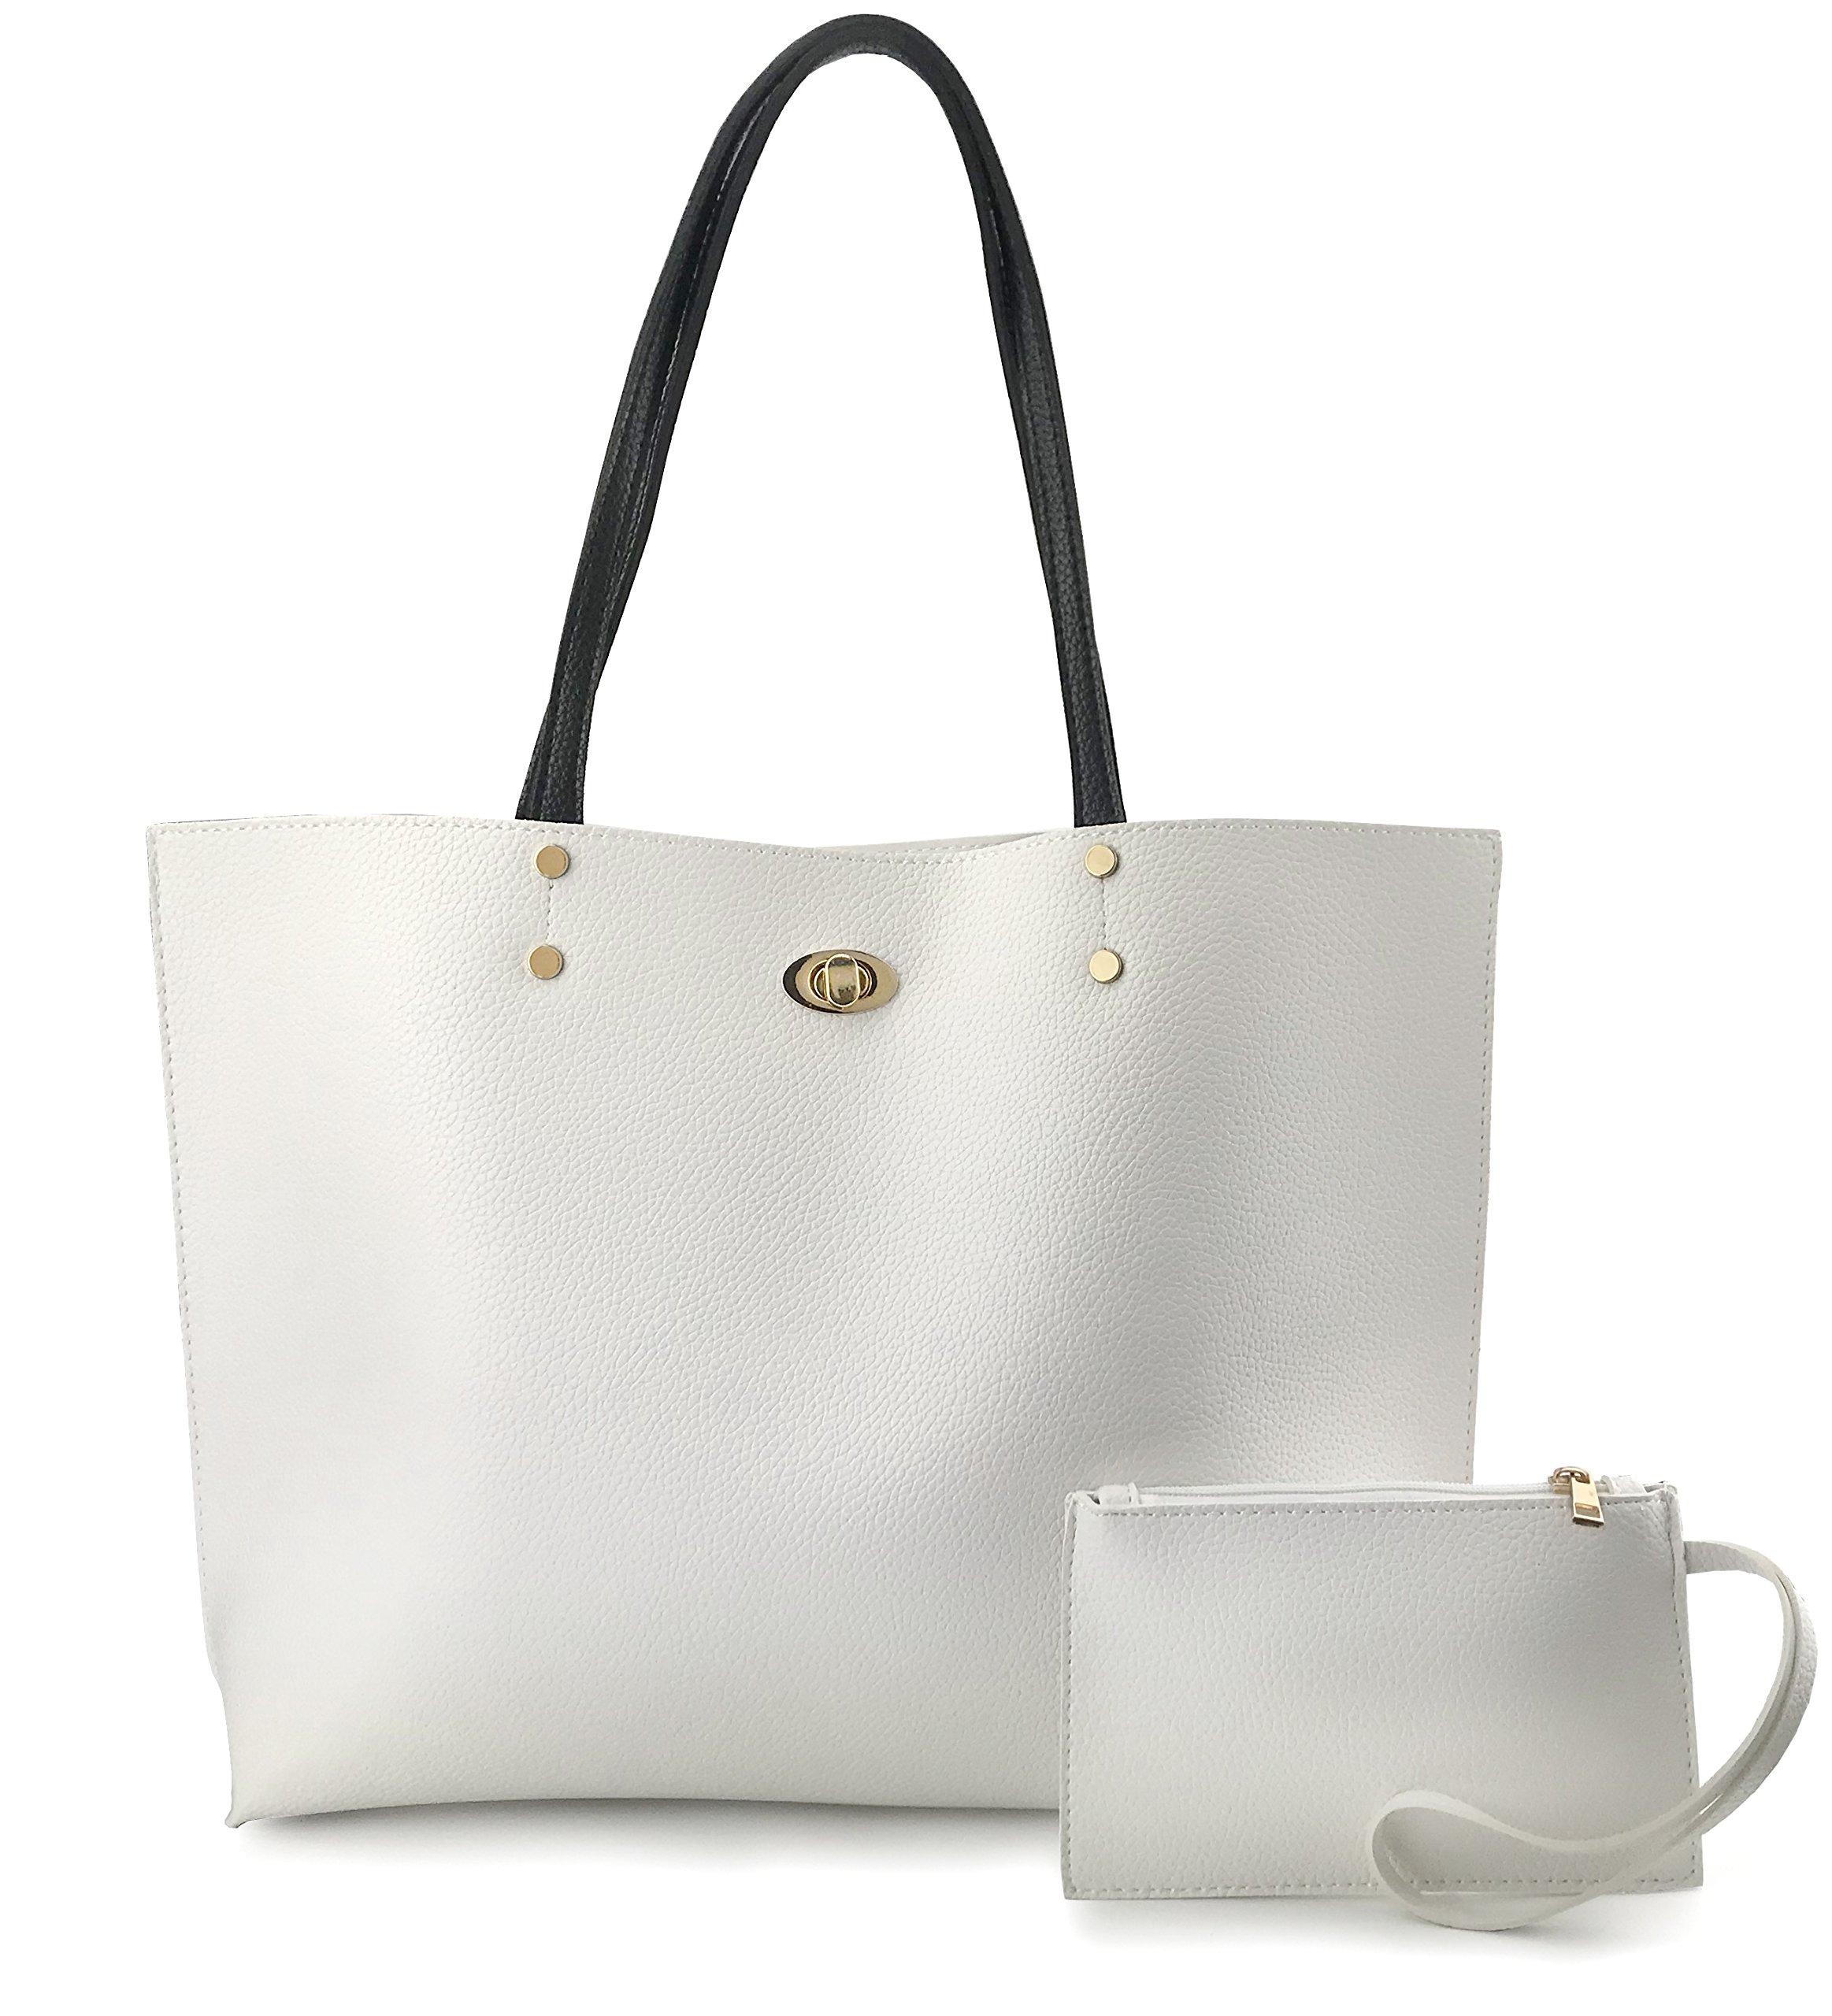 Women's Tote Color-Block Pebbled Faux Leather Shoulder Handbag With Zipper Pocuh Wristlet (White)